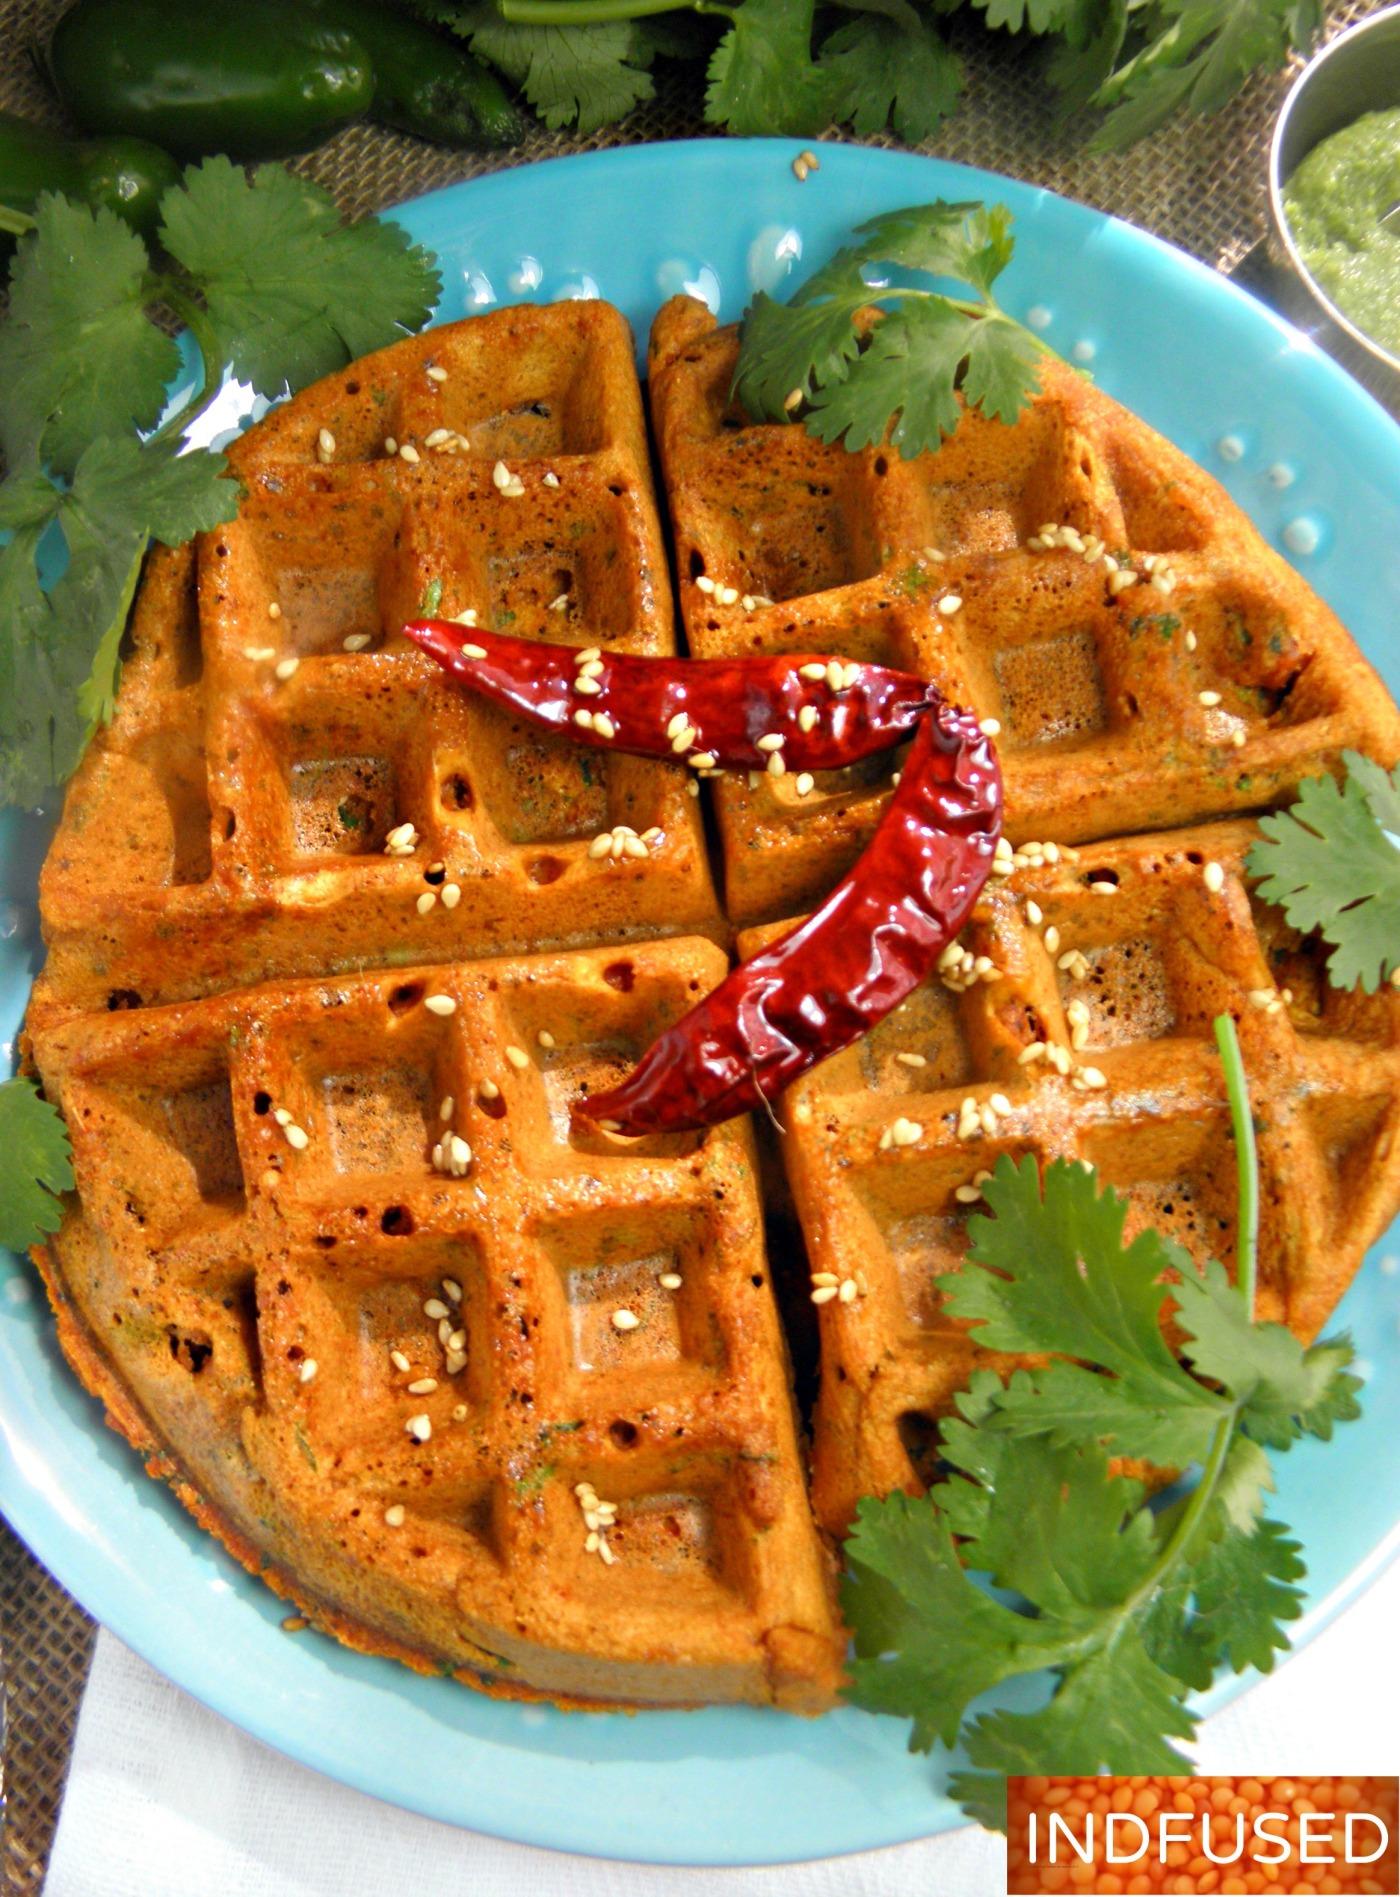 #Favorite #savory #Indian #spiced #snack for #teatime.#Gluten free#vegan#figure friendly #recipe using #misto oil spray